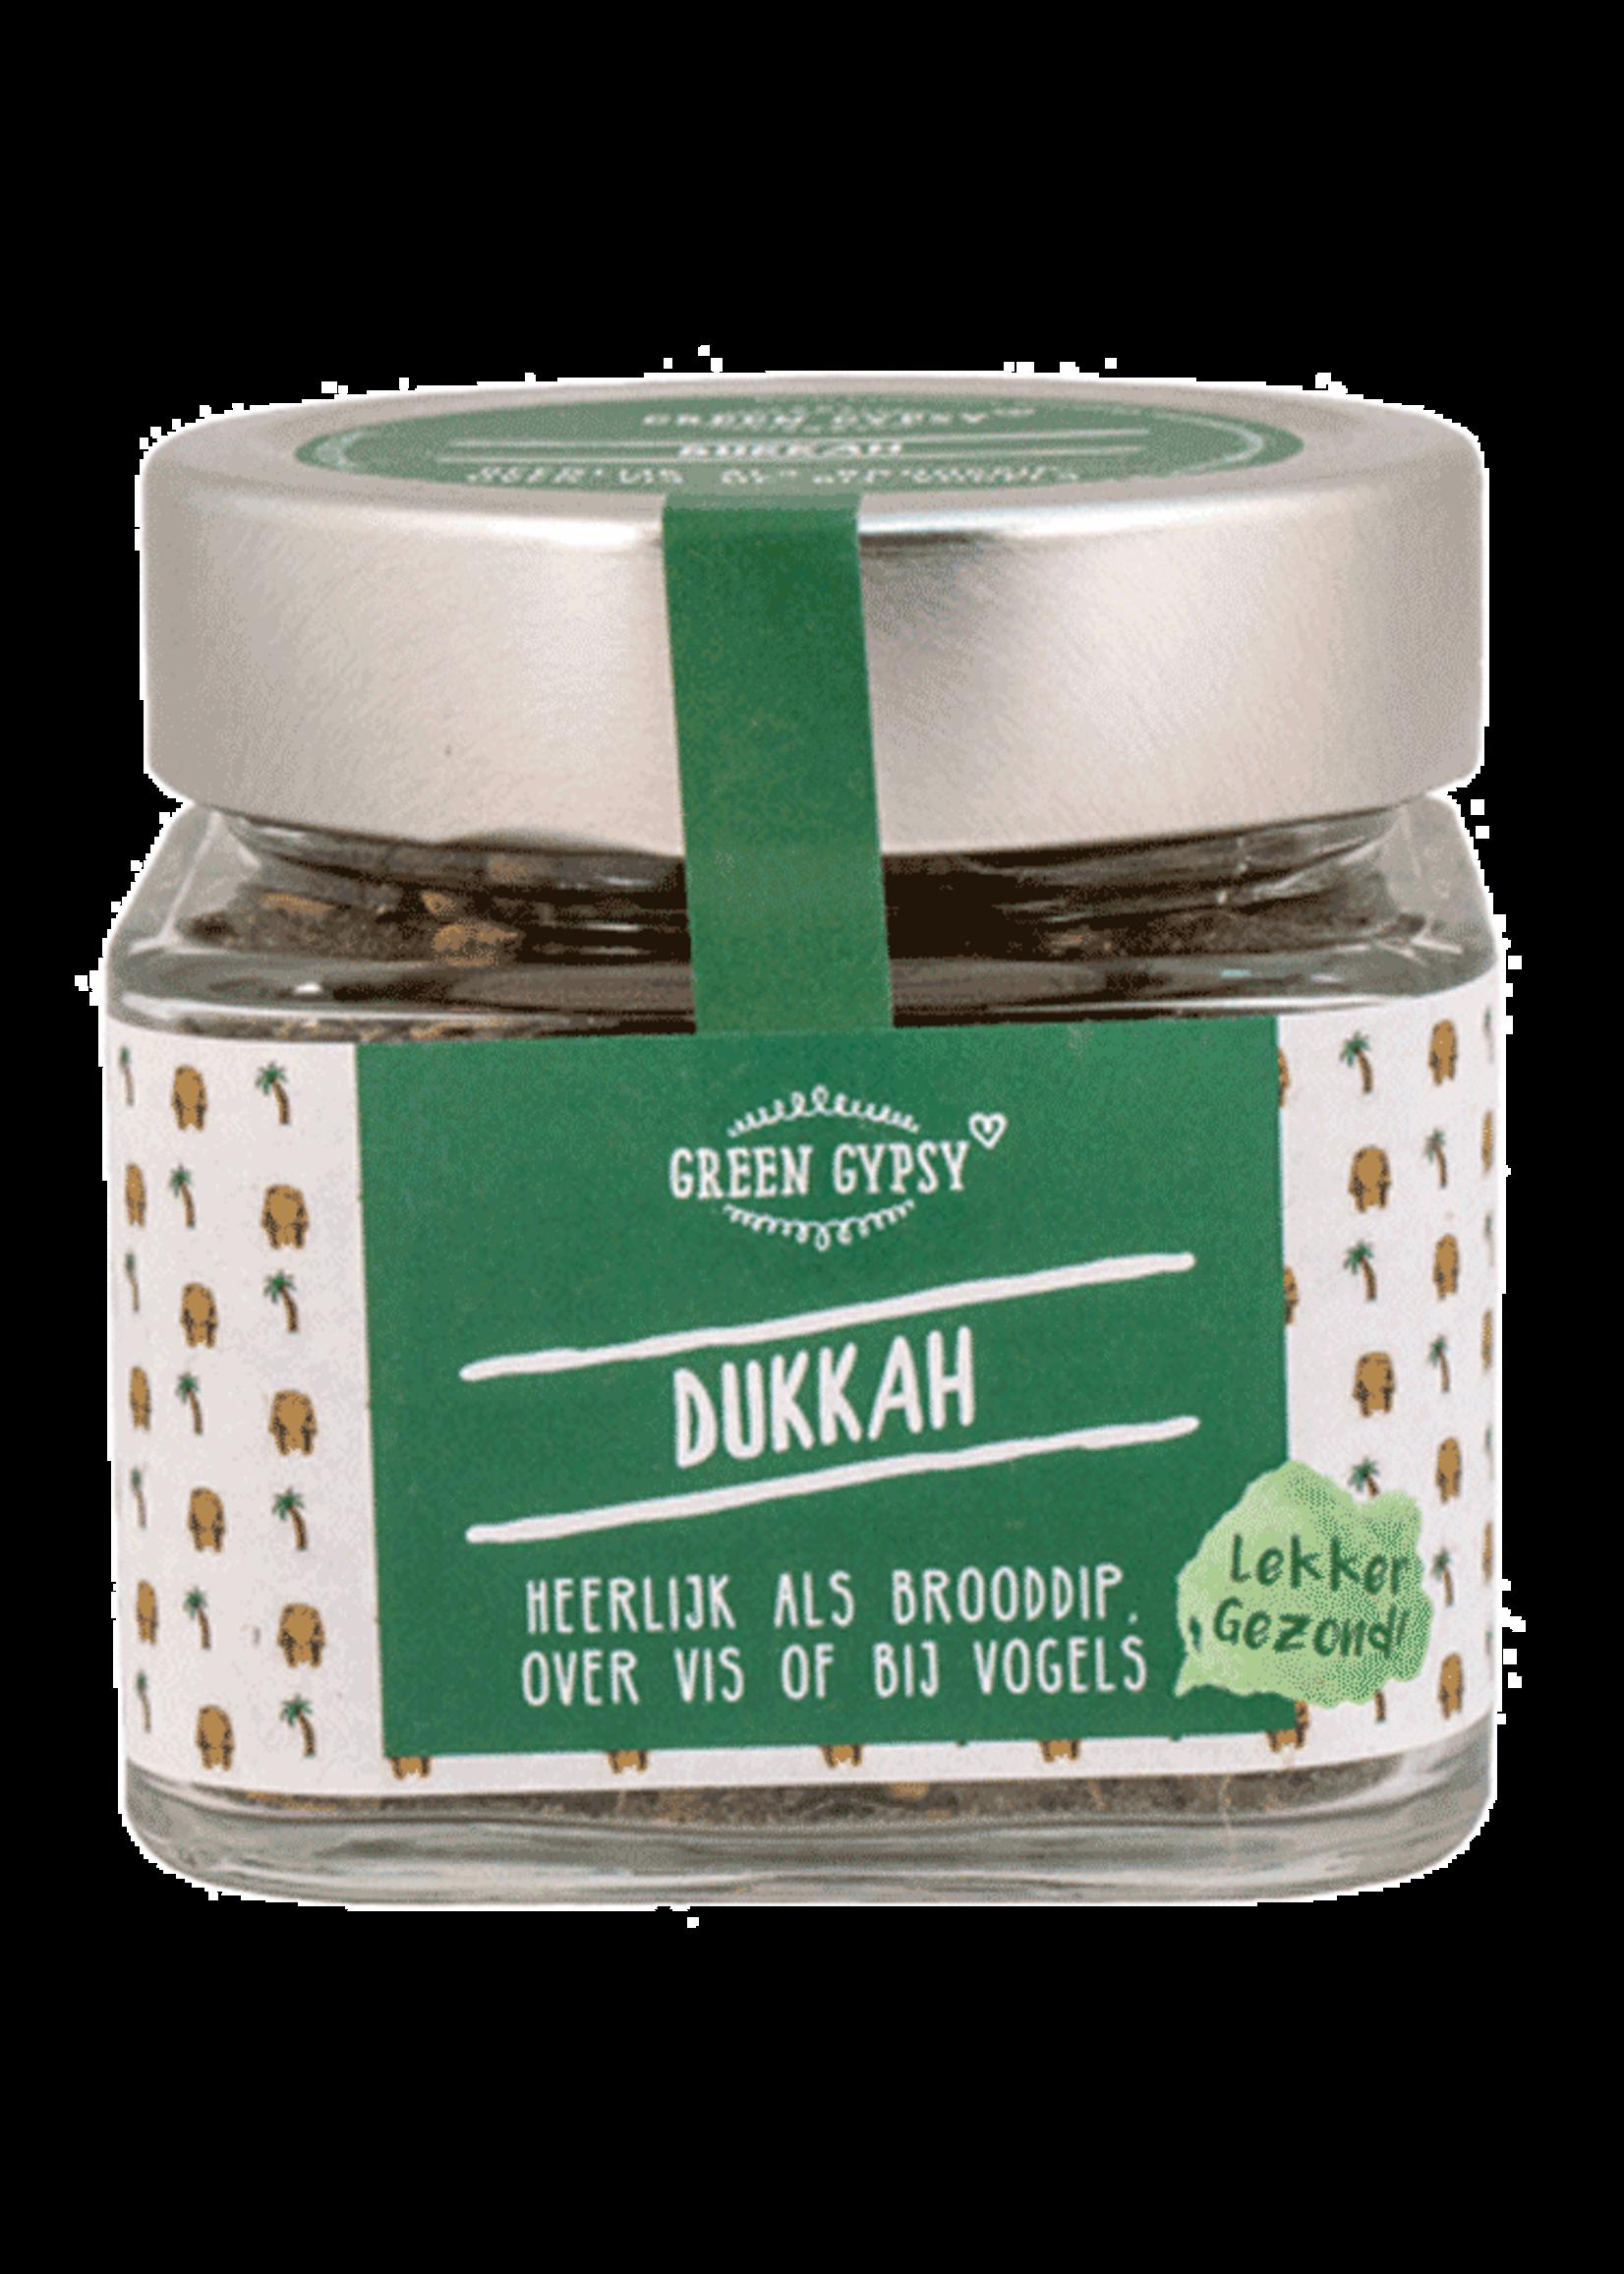 Green Gypsy Spices Kruidenmix Dukkah Green Gypsy